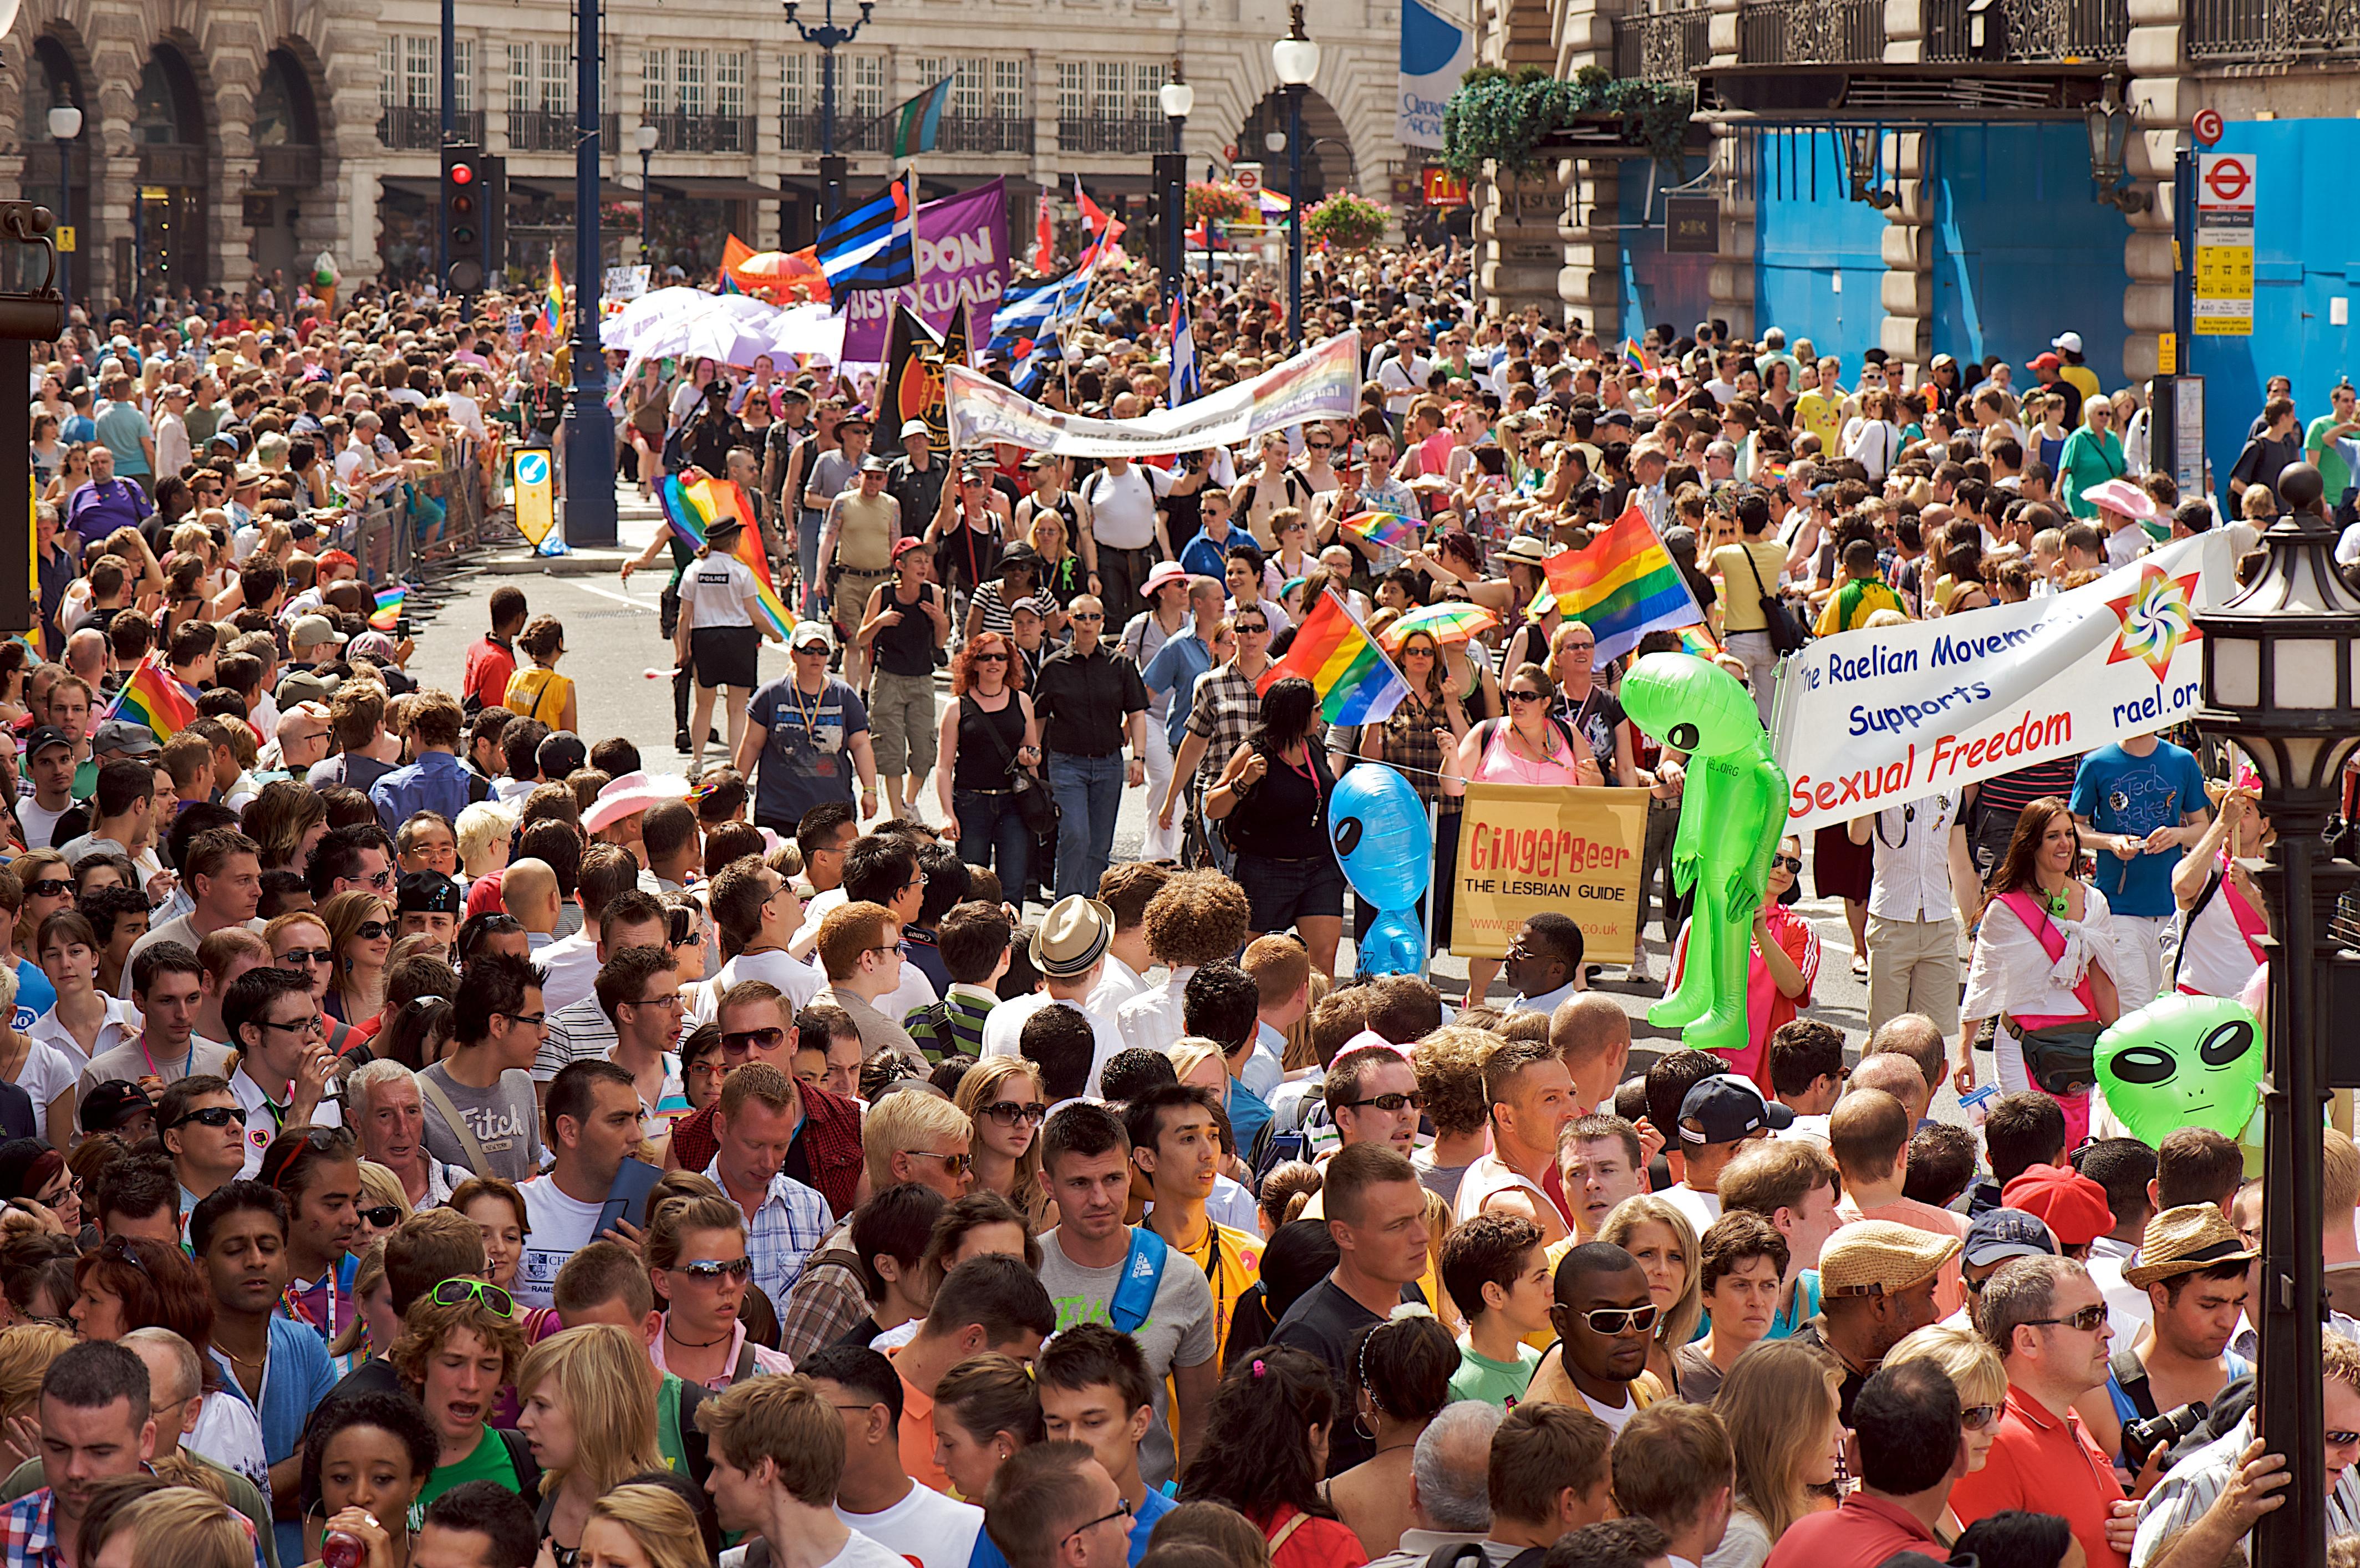 Gay pride fancy dress accessory rainbow hats jewellery lgbt parade party lot uk